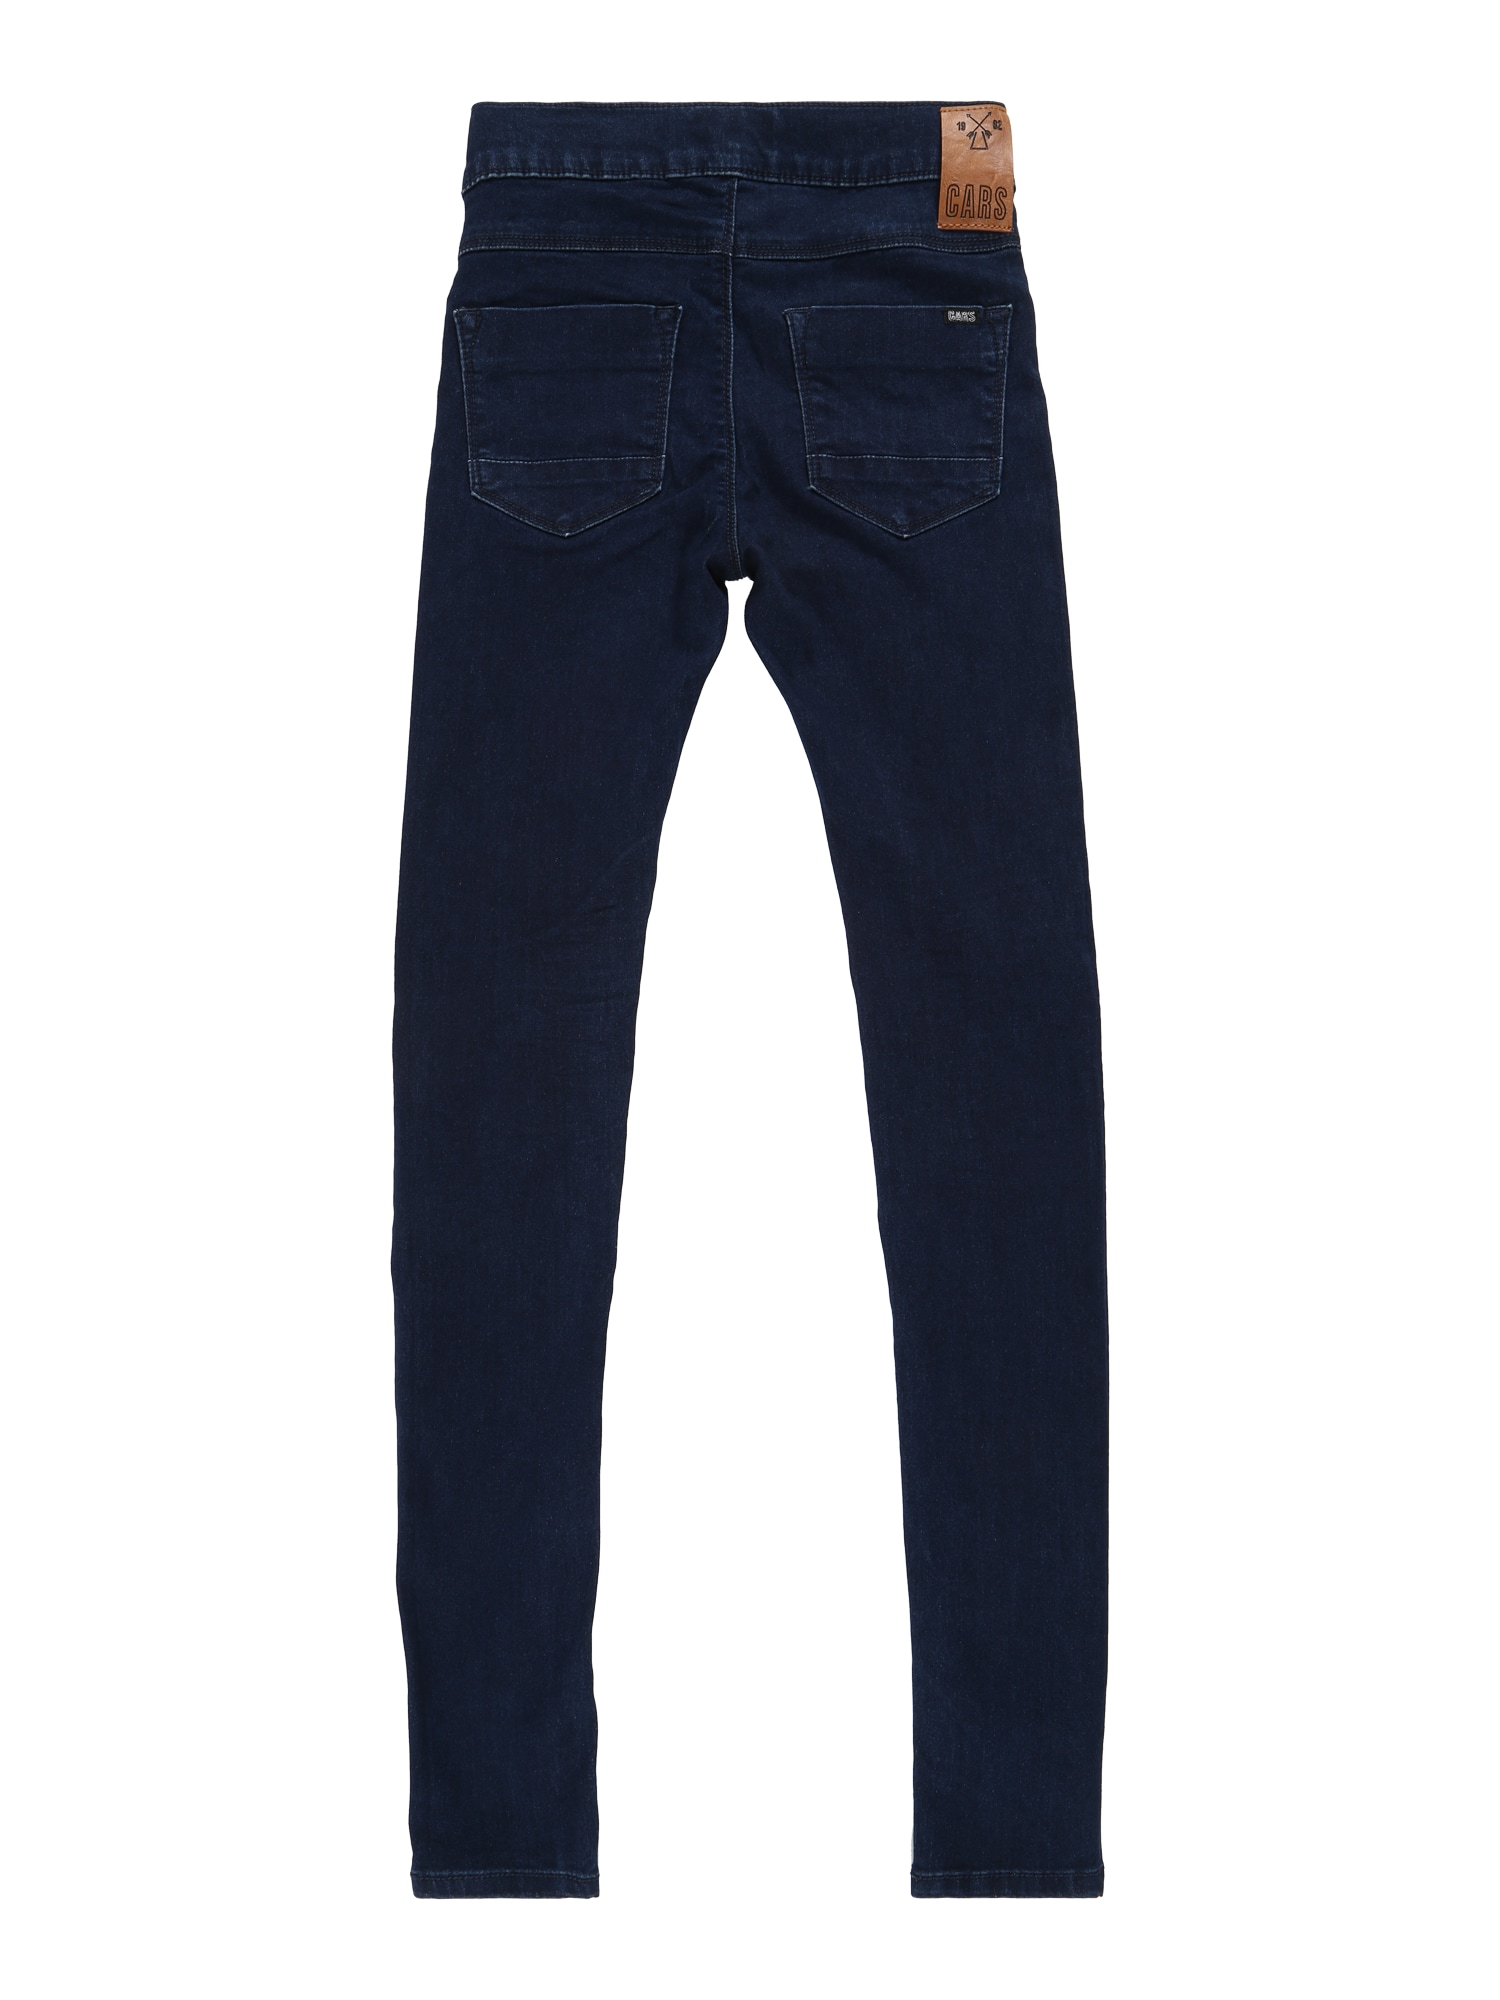 Cars Jeans Jeans  blå denim